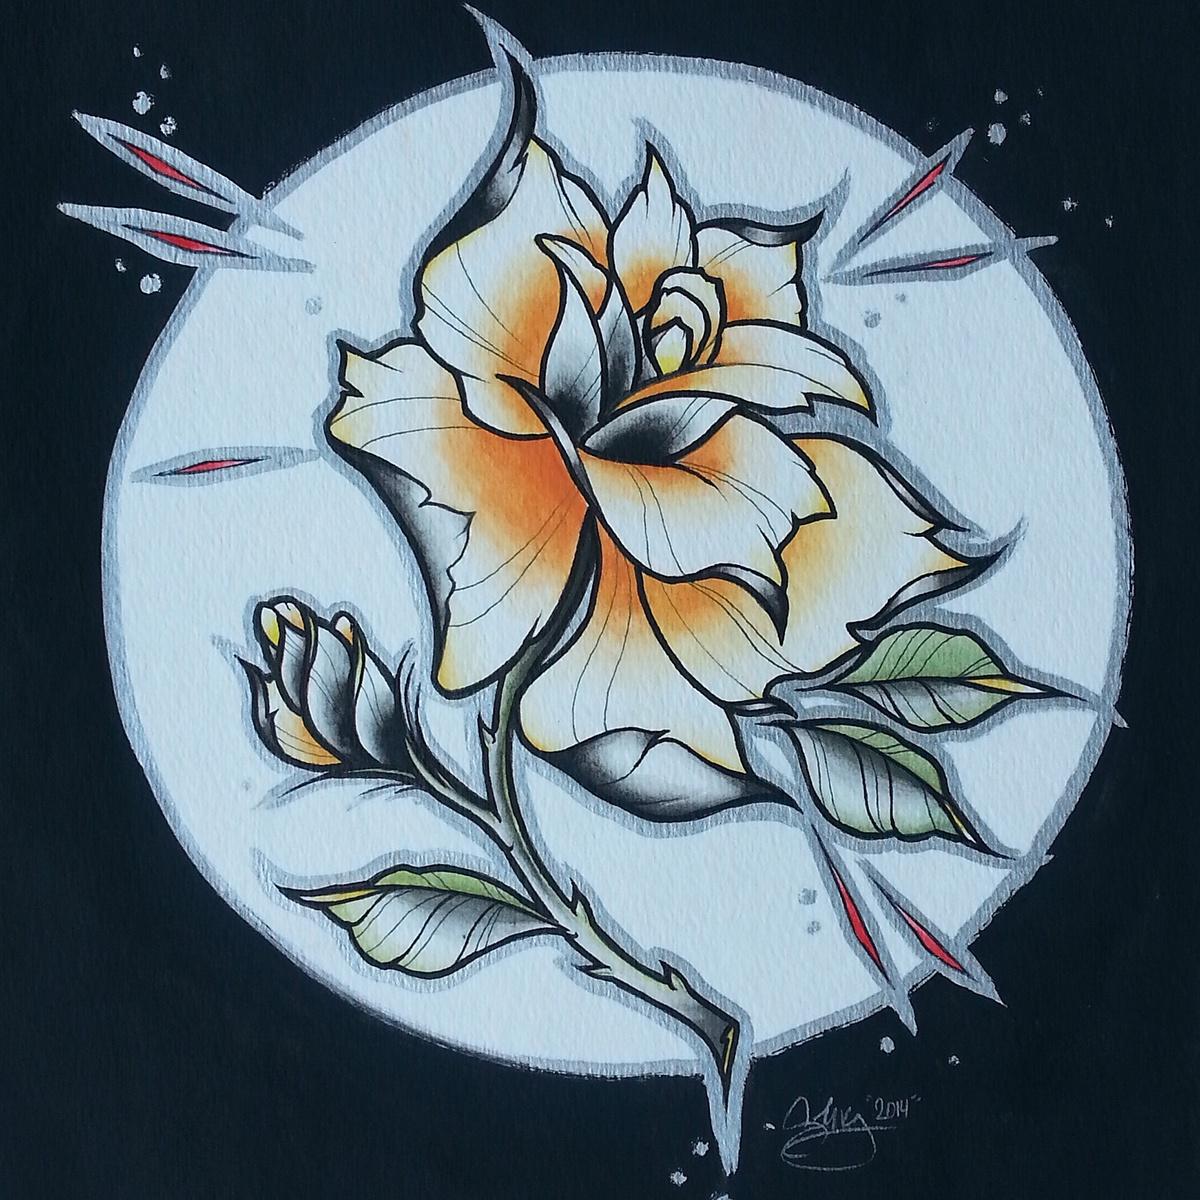 spray paint Marker stencil stenciling lantern horror Roses filigree bat dracula Victorian Lamp canvas prismacolor colored pencil